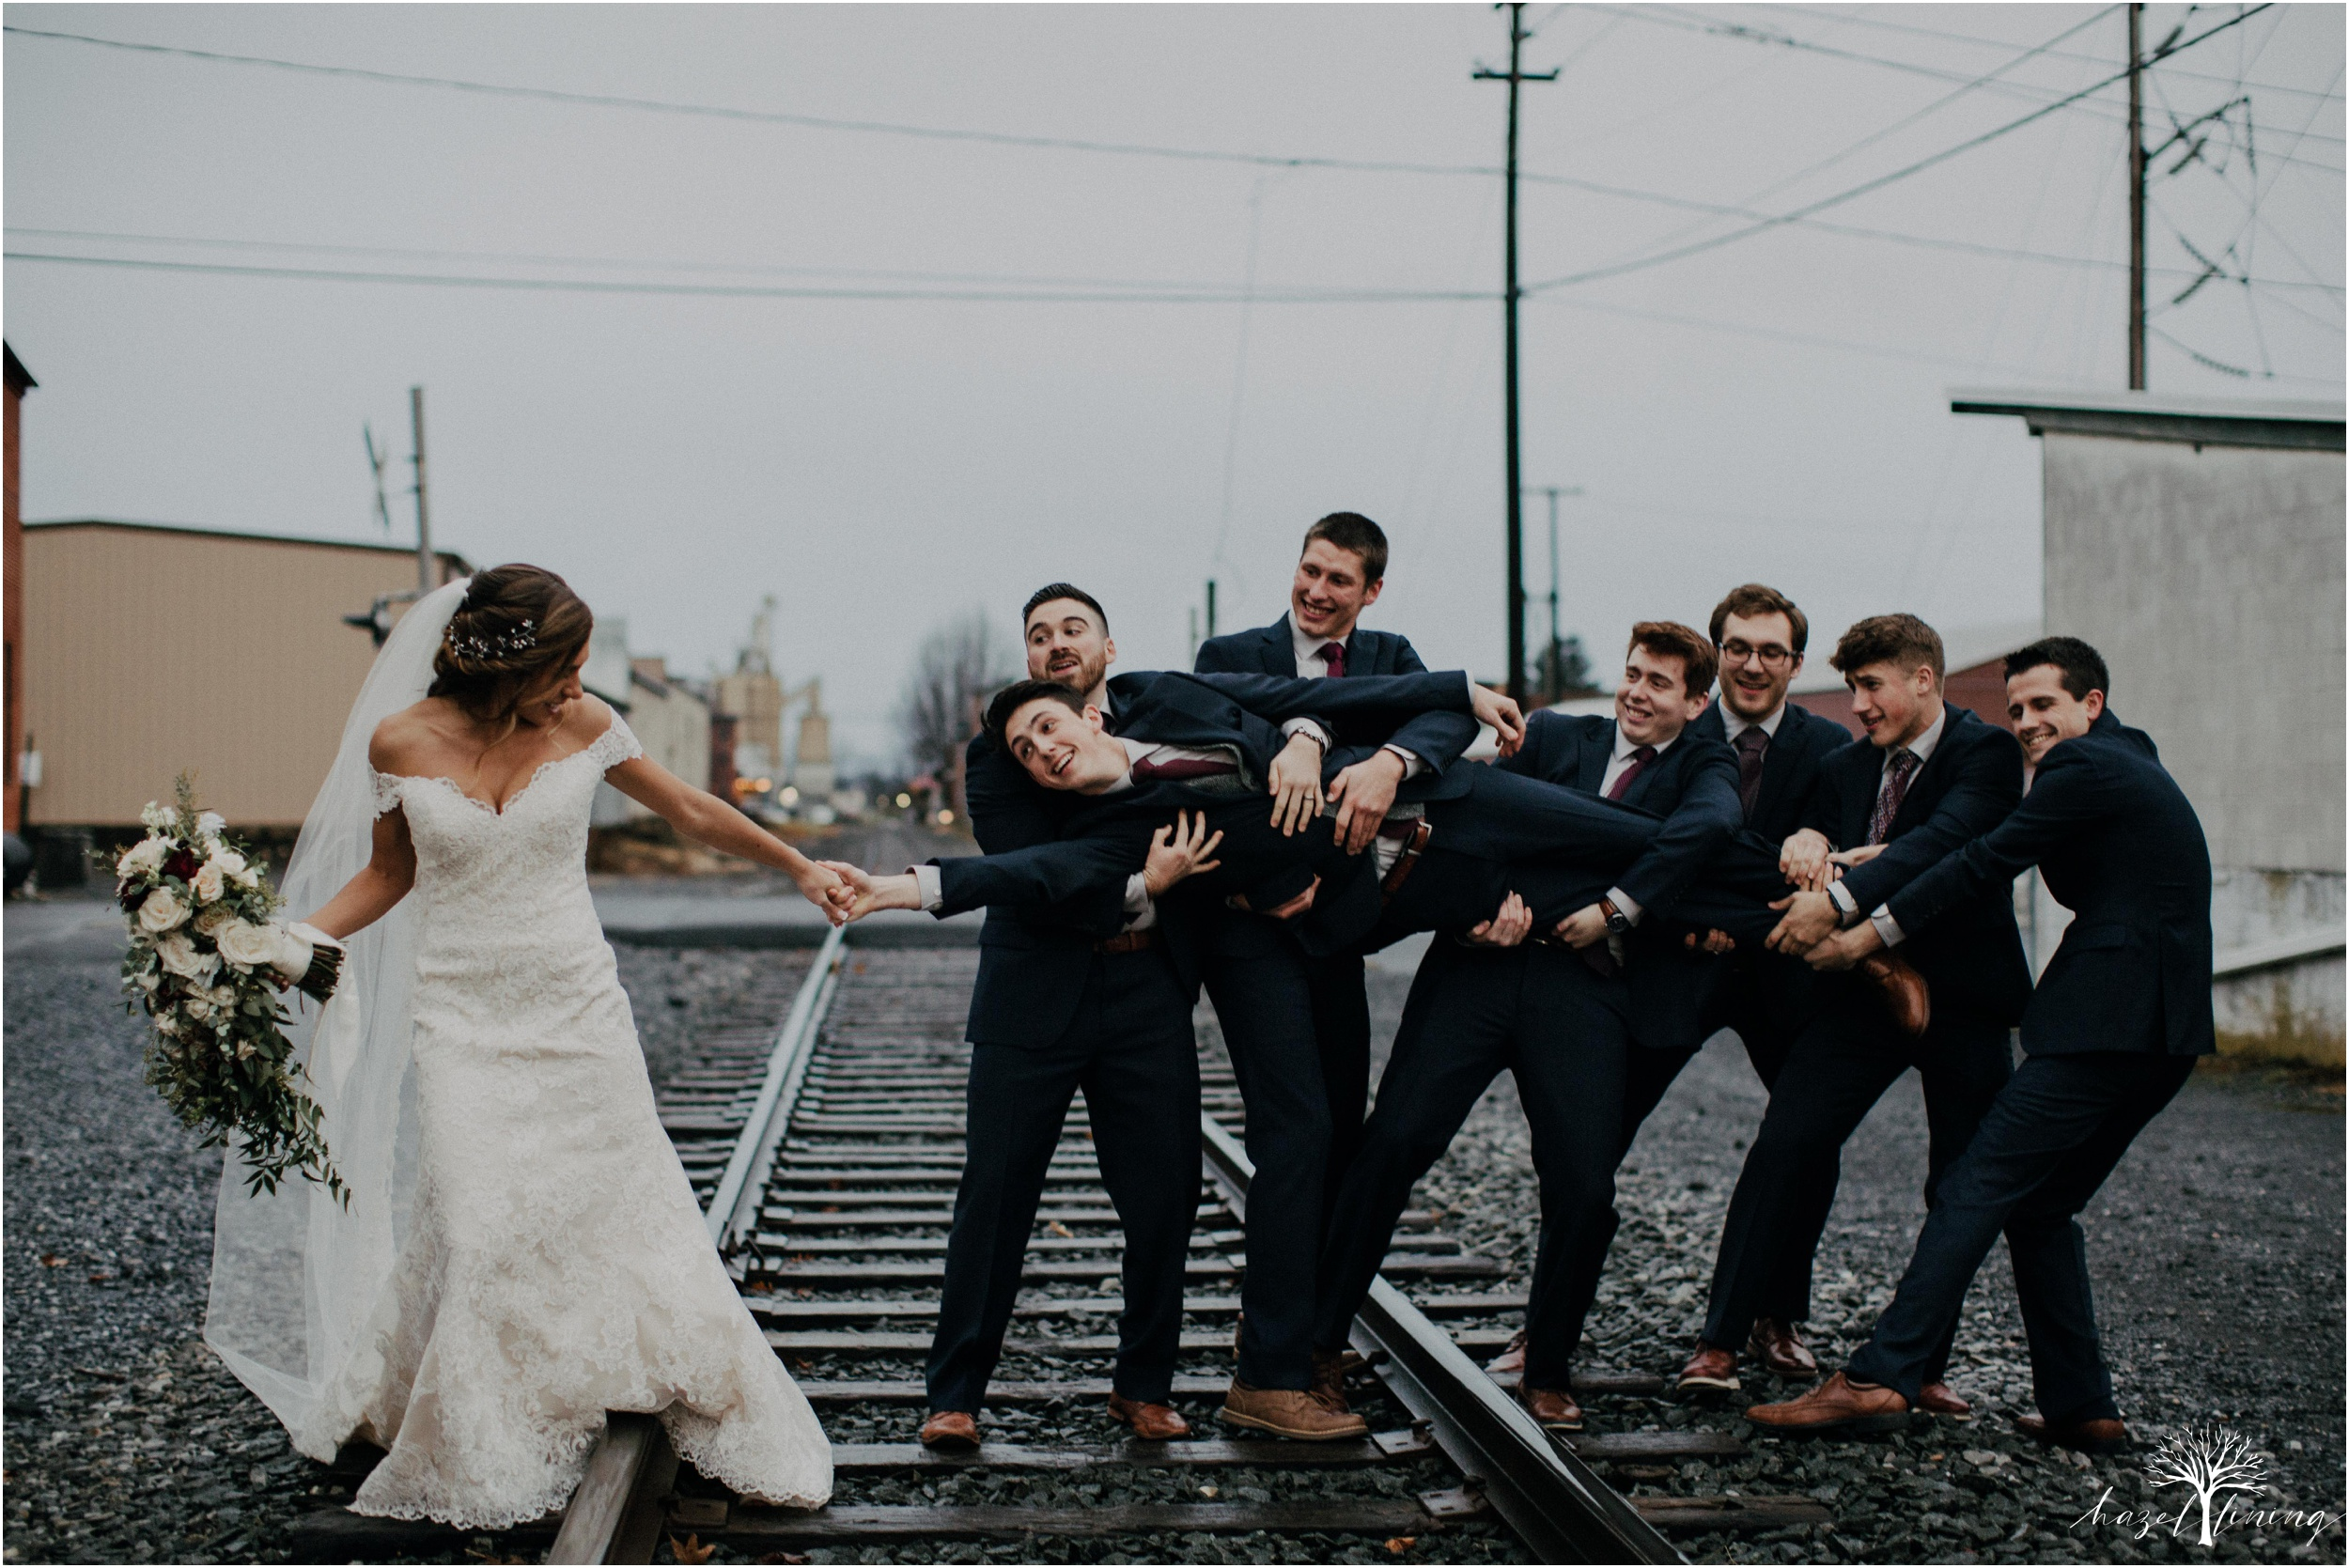 emma-matt-gehringer-the-booking-house-lancaster-manhiem-pennsylvania-winter-wedding_0097.jpg